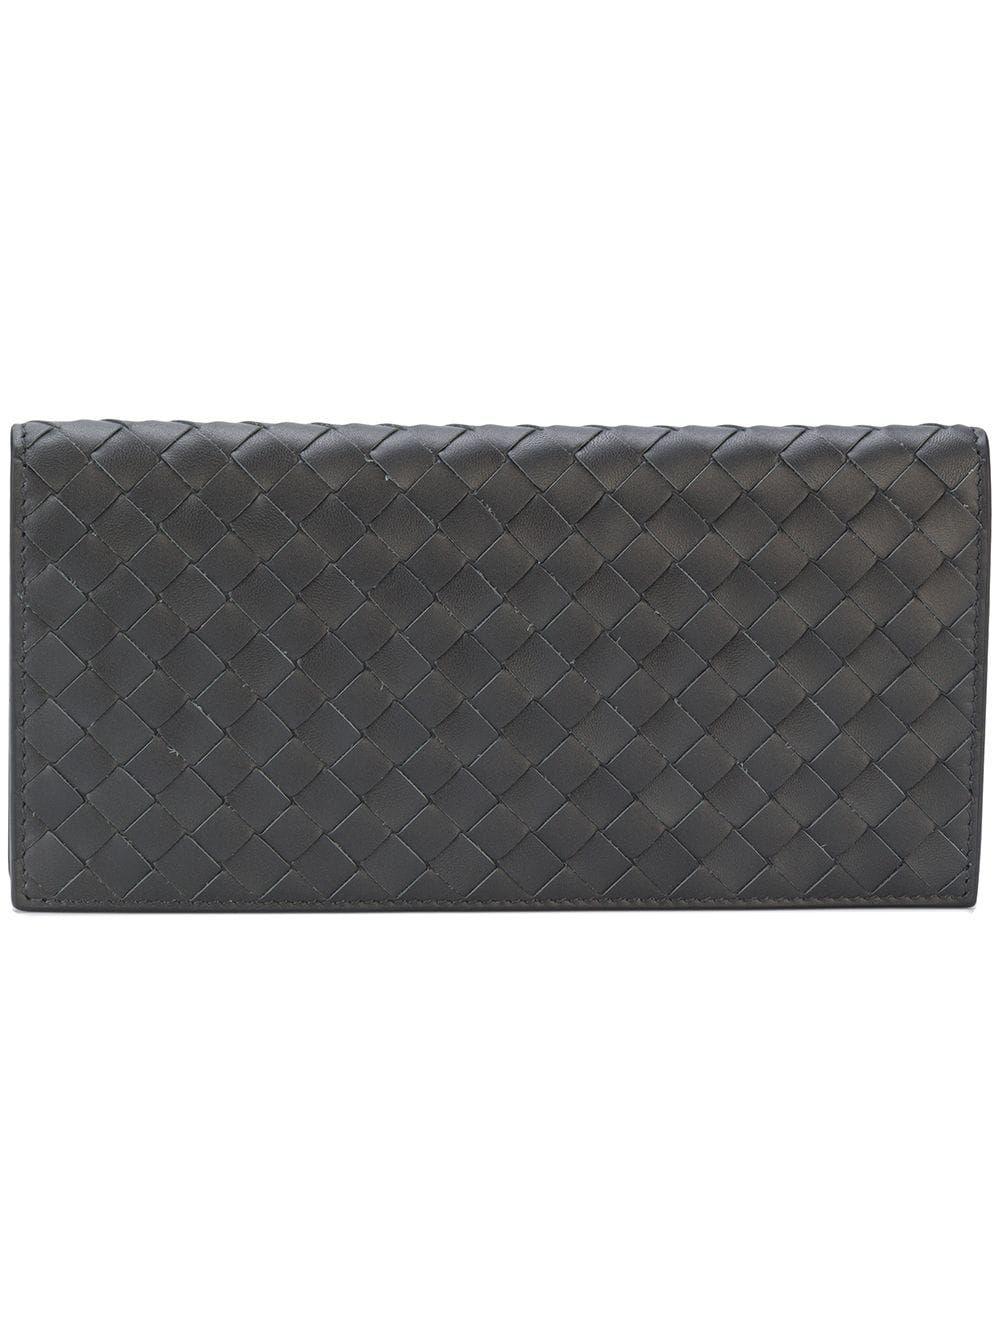 Bottega intrecciato weave continental wallet